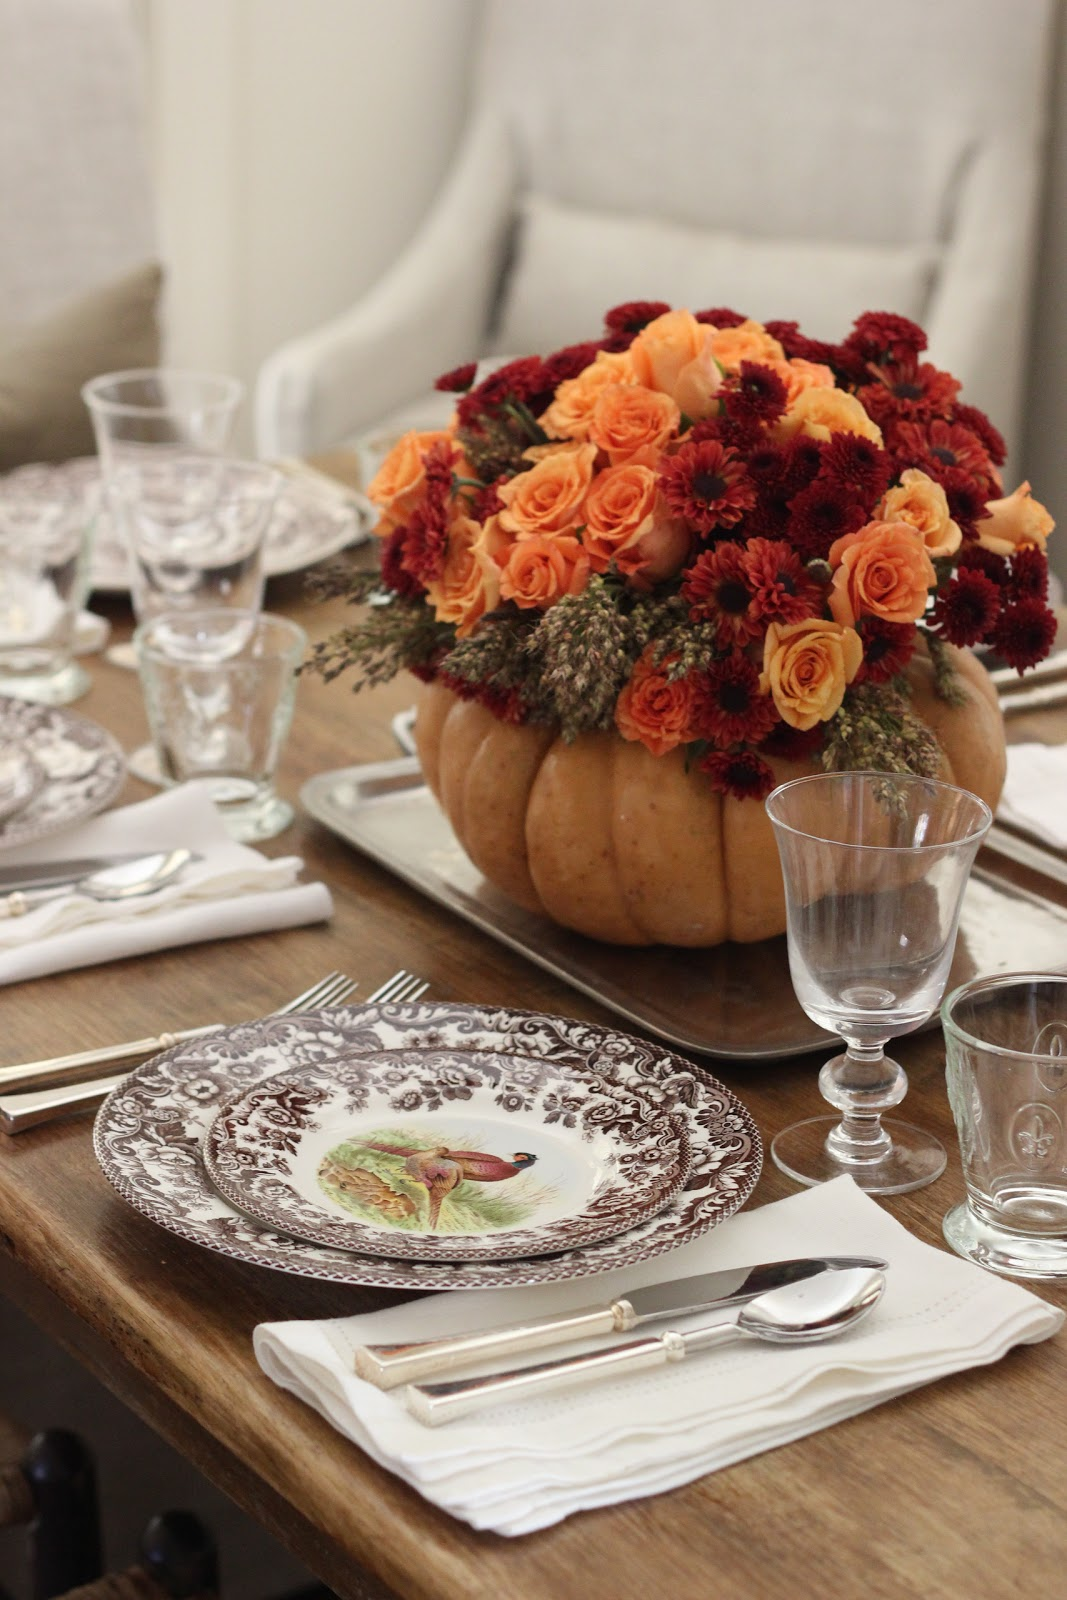 Roses, Mums and Broom Cob in a Pumpkin Vase